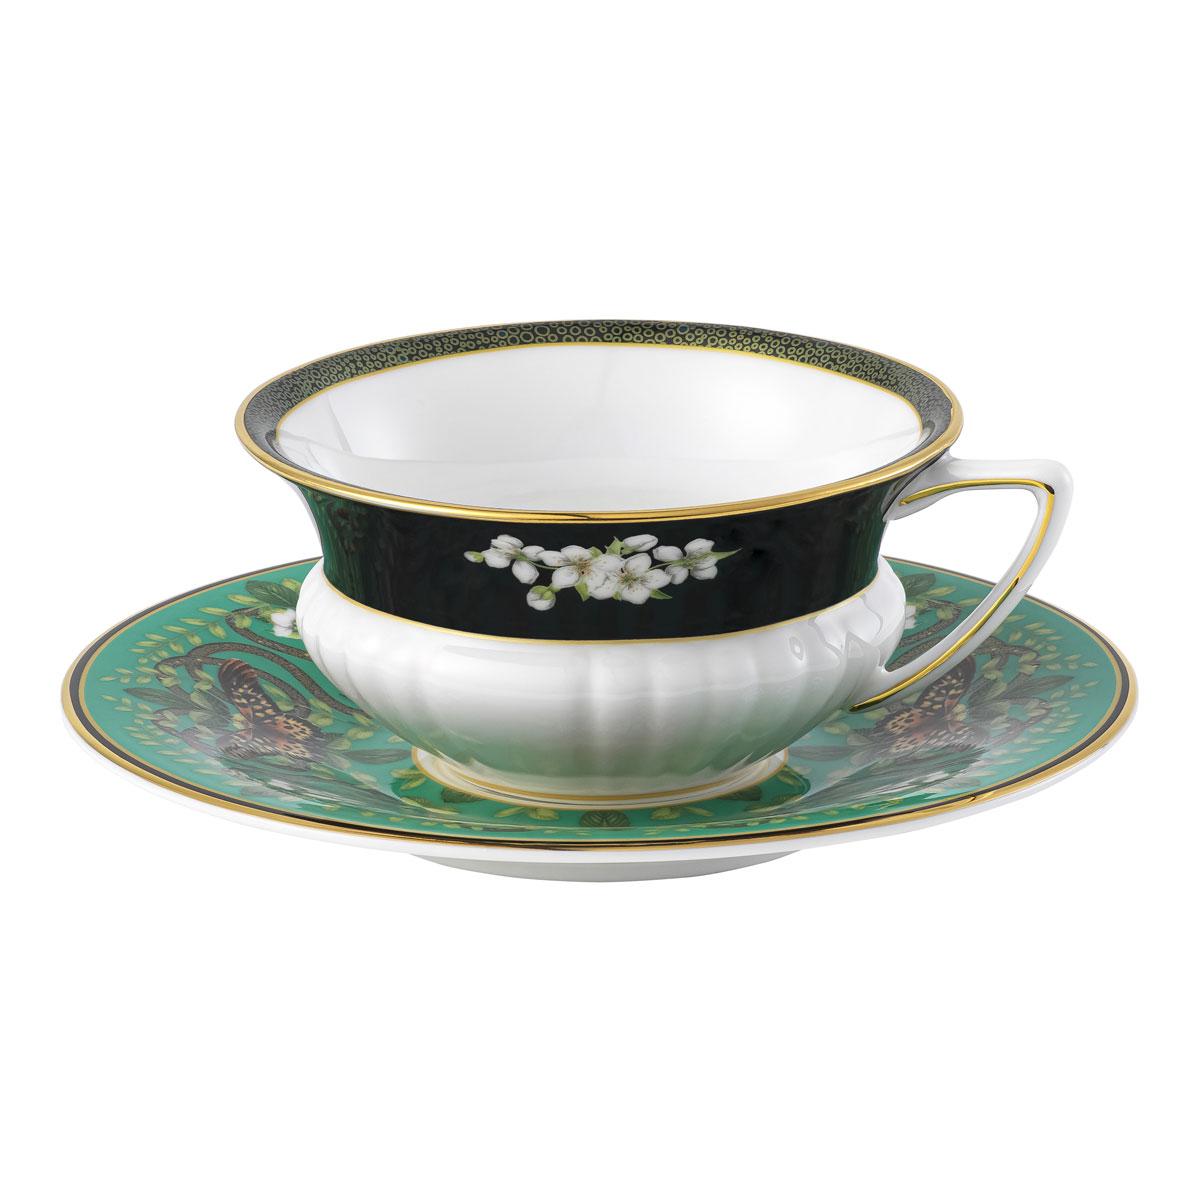 Wedgwood Wonderlust Emerald Forest Teacup and Saucer